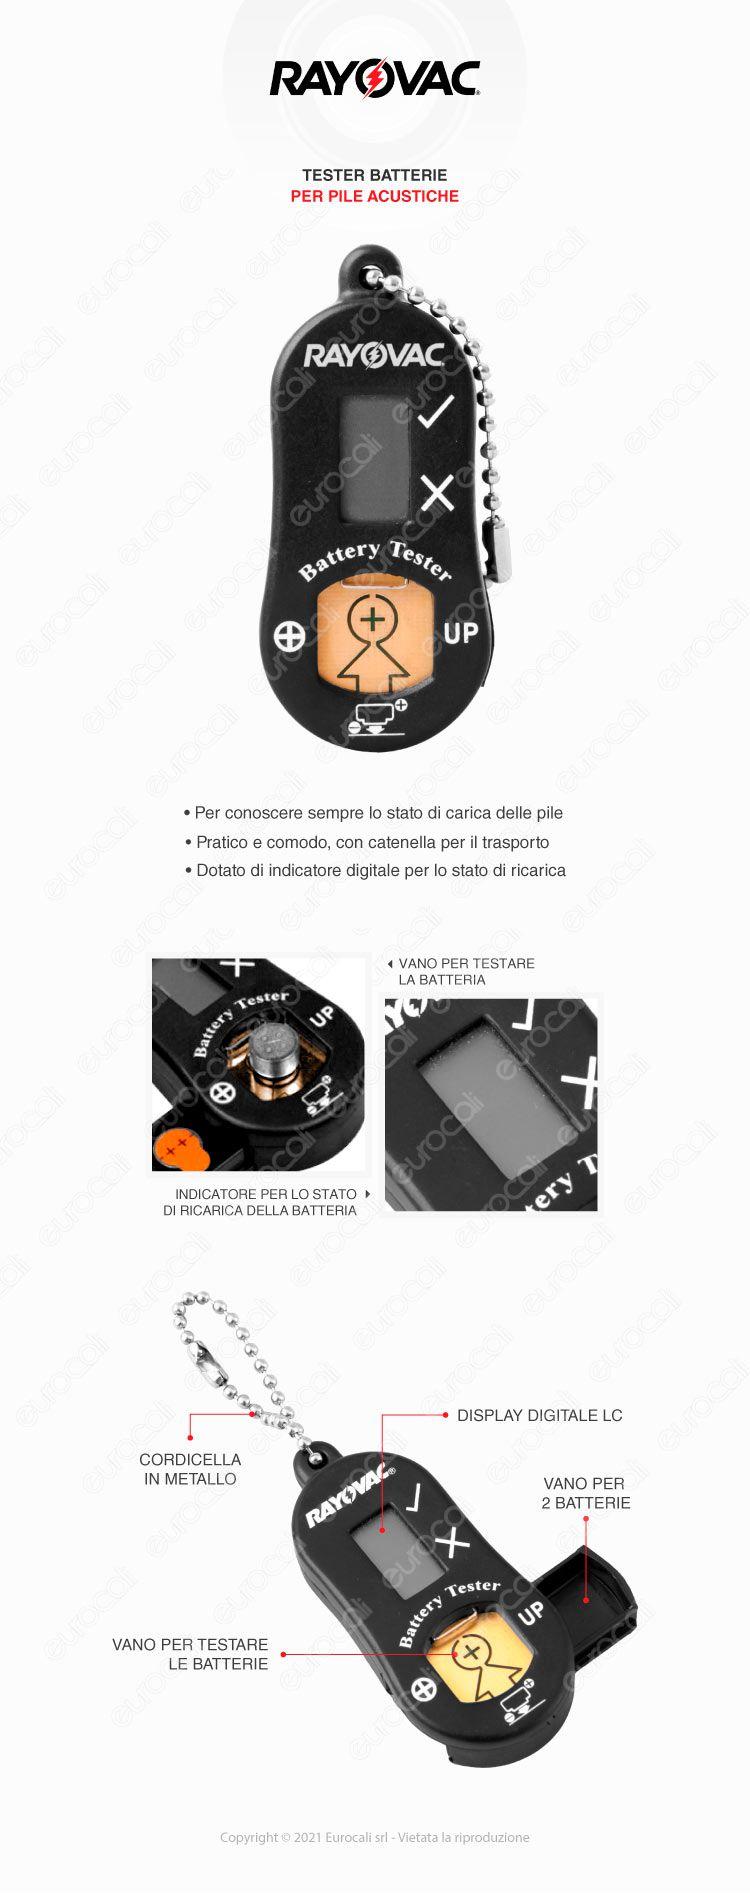 rayovac battery tester